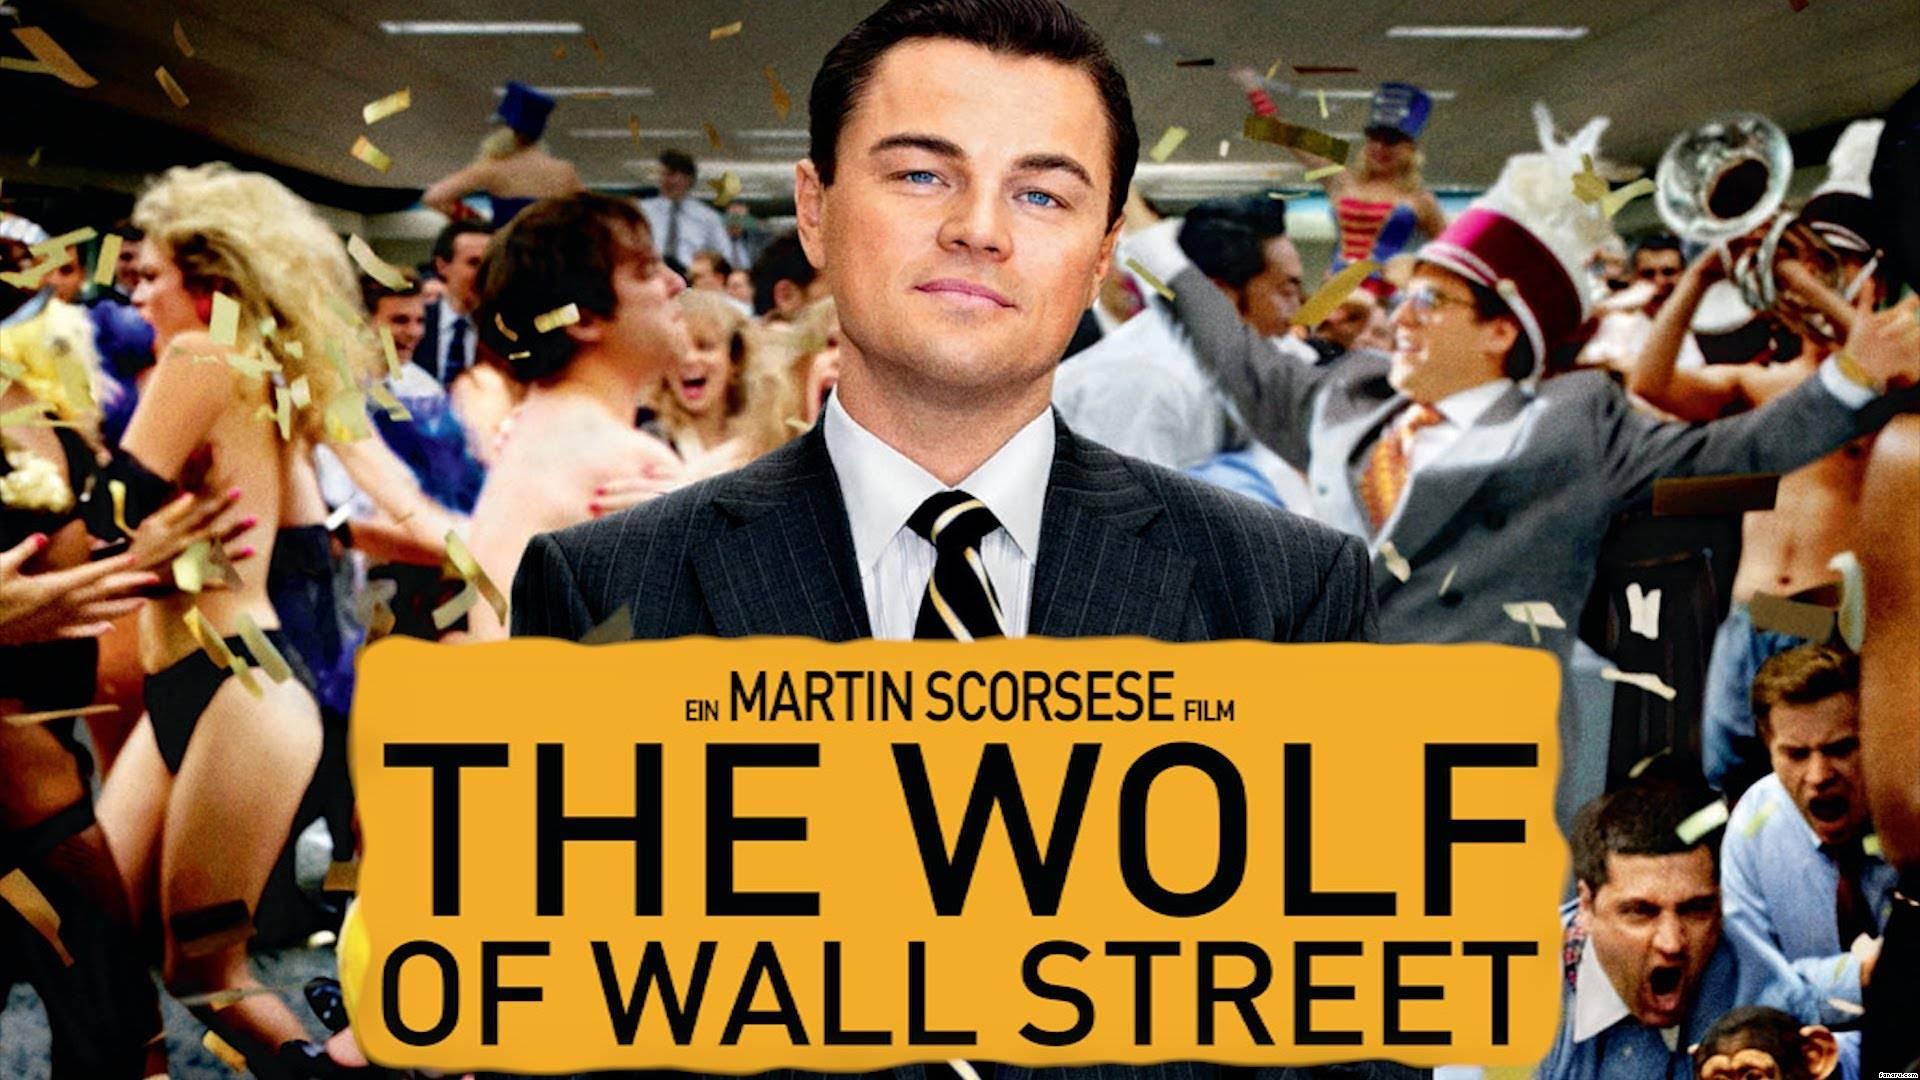 The Wolf Of Wall Street Wallpaper 13413 Wallpaper Wallpaper hd 1920x1080